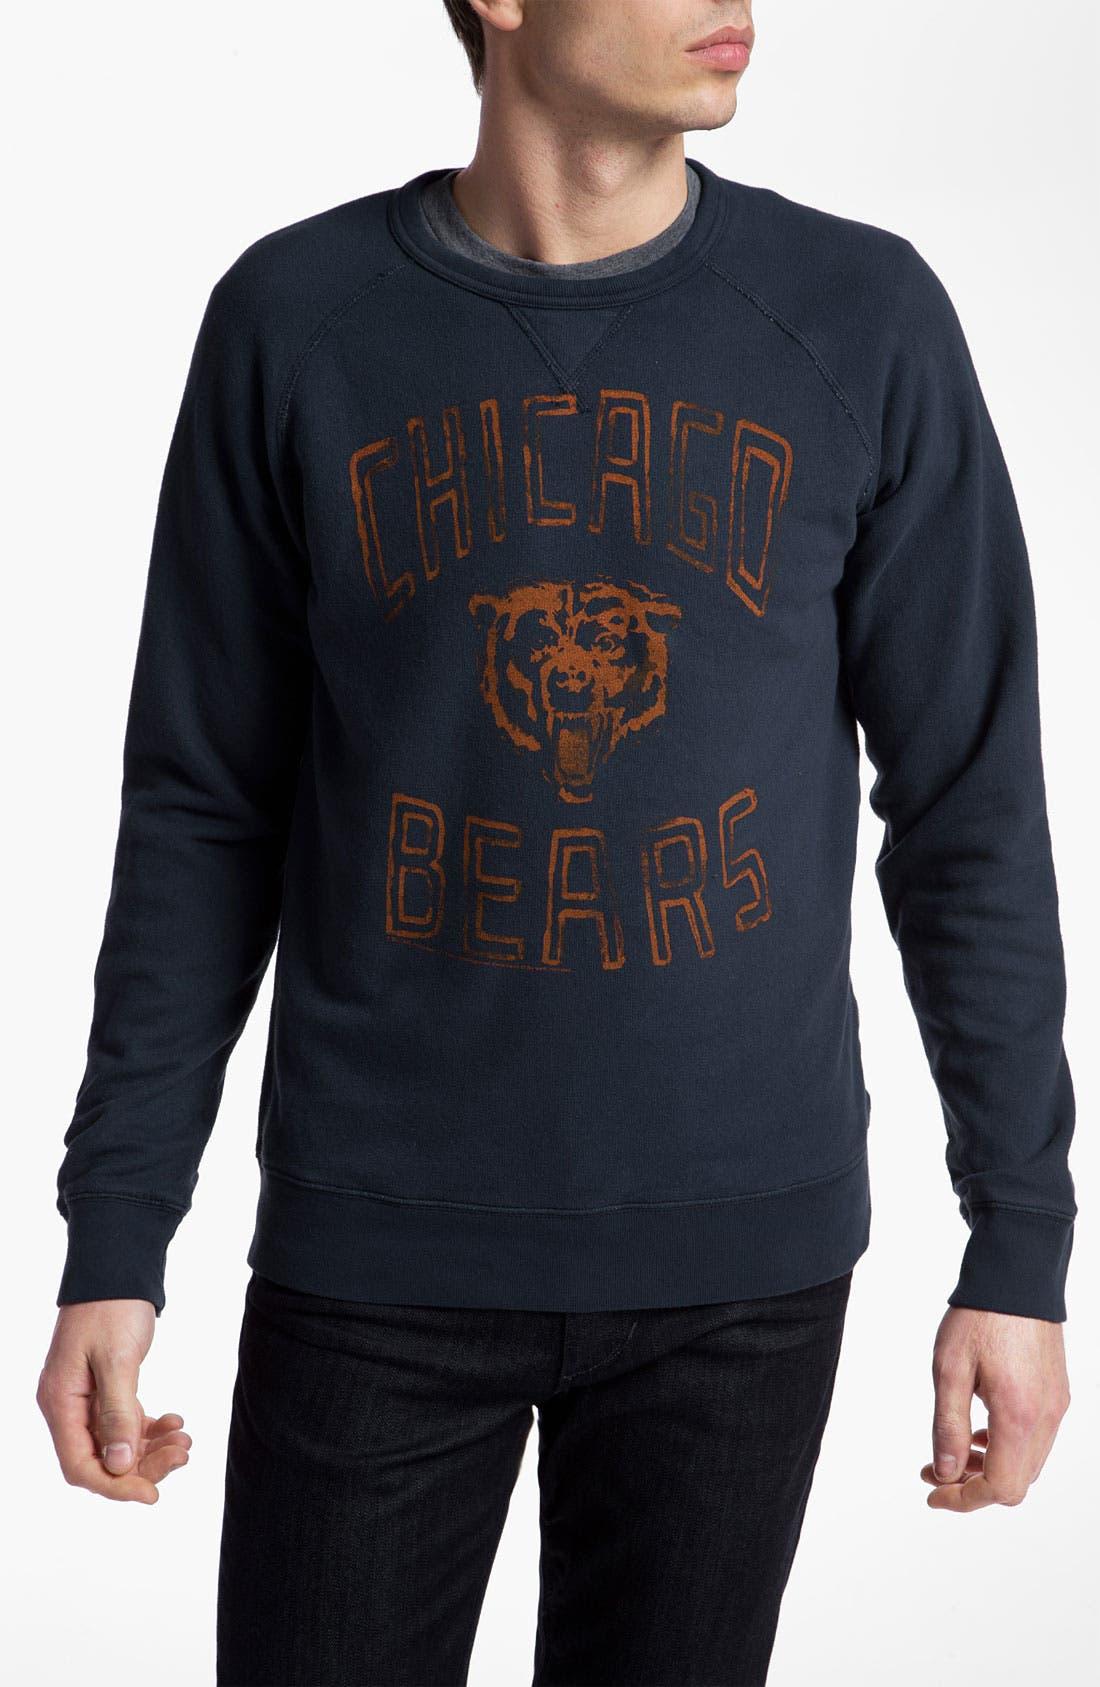 Main Image - Junk Food 'Chicago Bears' Sweatshirt